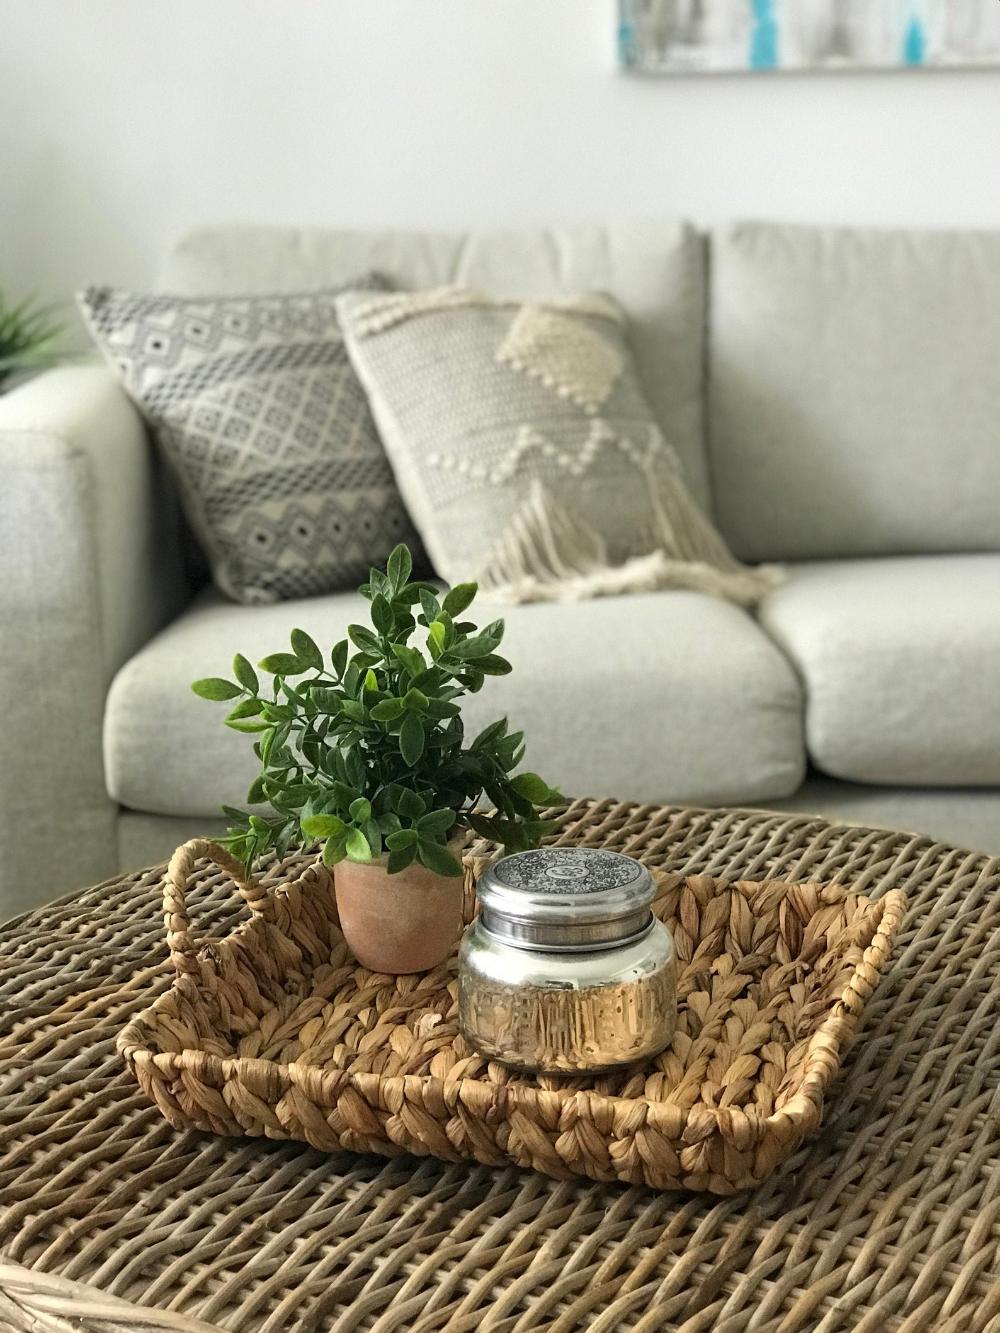 Woven Wicker Tray Wicker Serving Tray With Handles Ottoman Tray Farmhouse Basket Tray Coffee Table Tray Water Hyacinth Tray Tray Table Decor Wicker Tray Coffee Table Decor Tray [ 1333 x 1000 Pixel ]